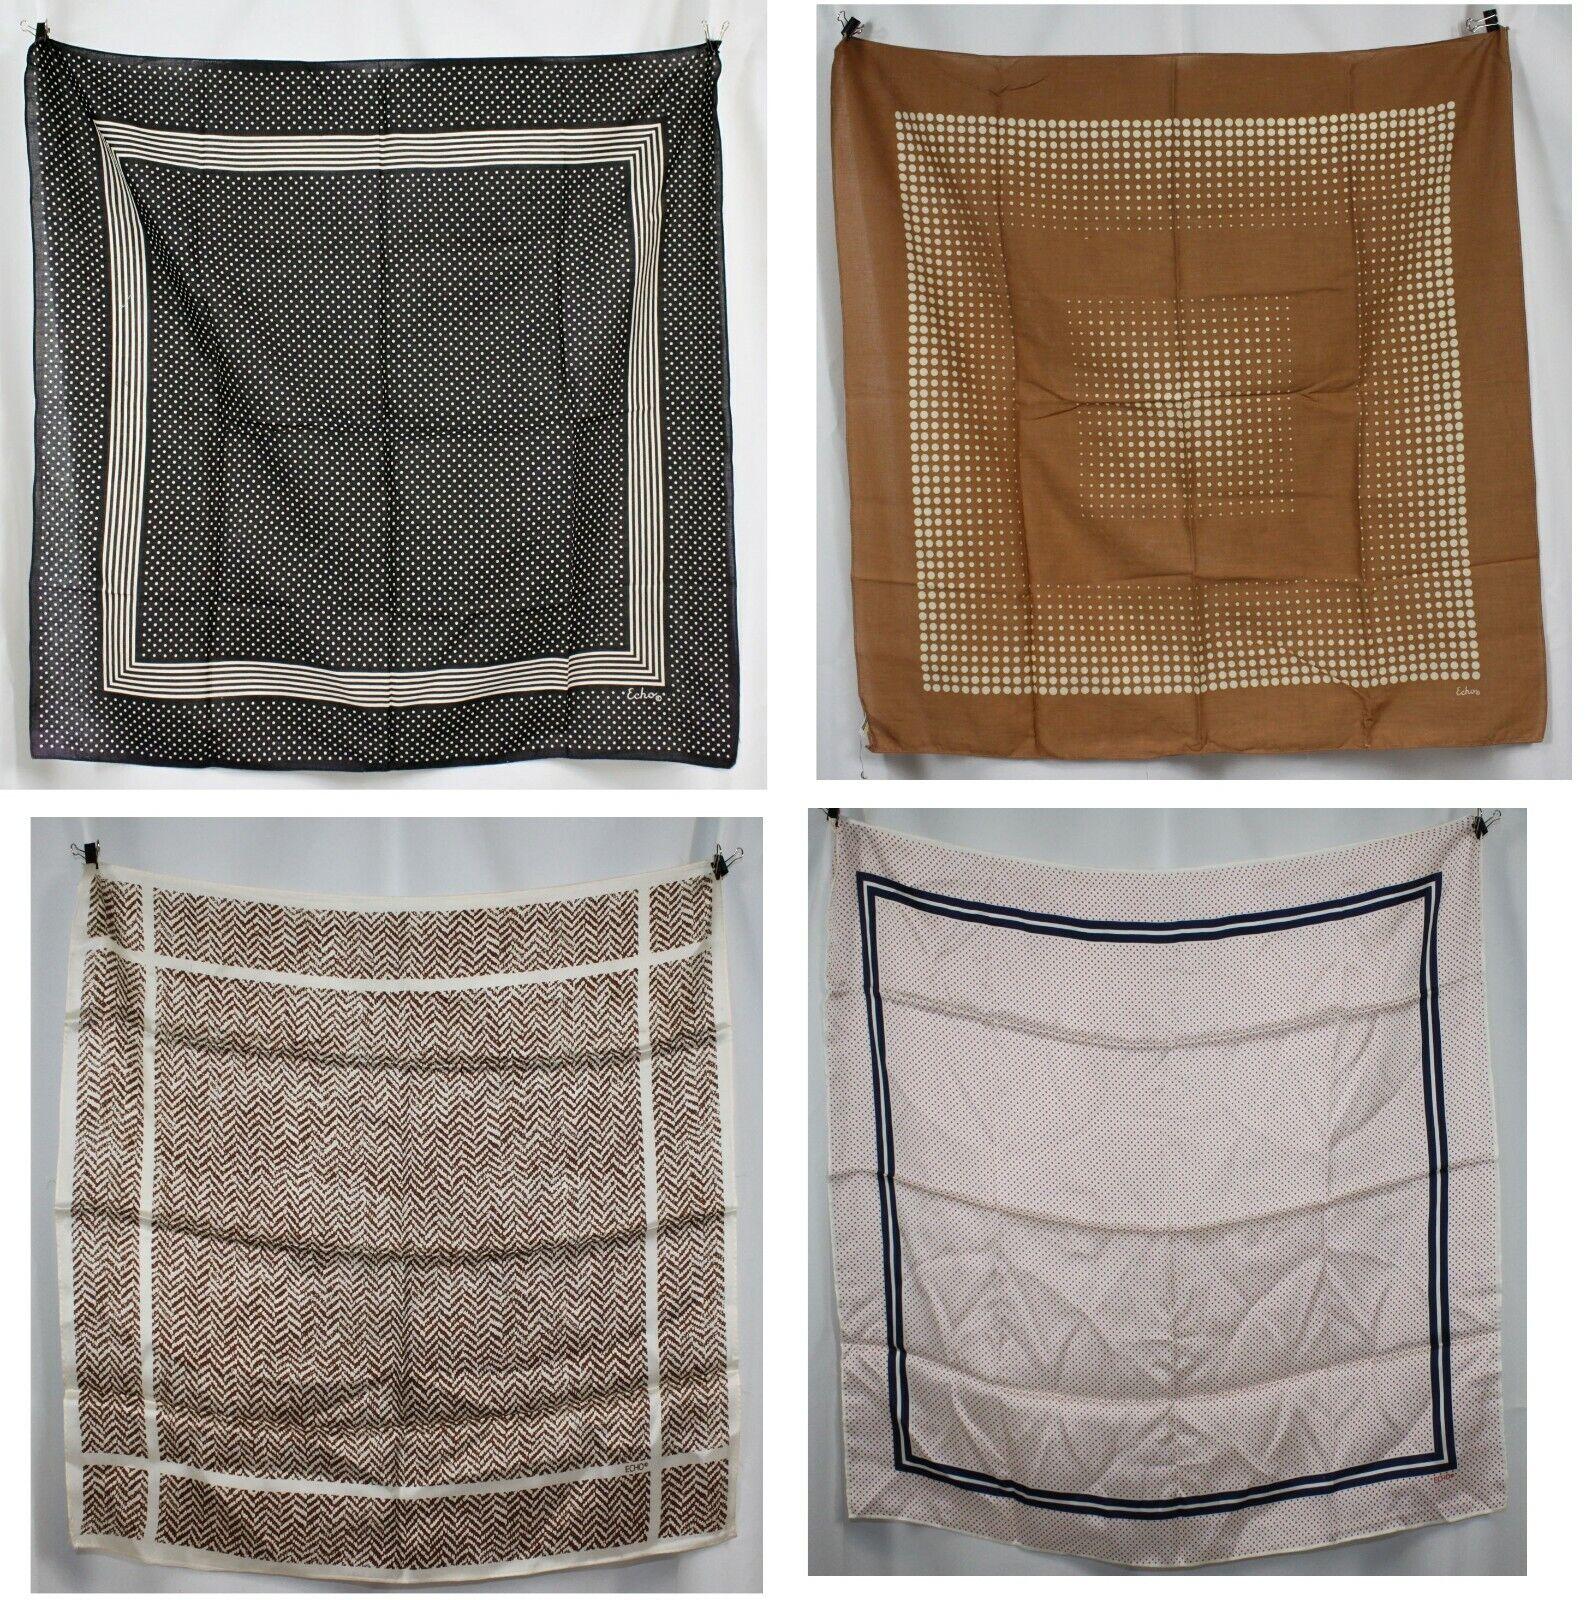 4 Vintage Echo Scarf Scarves Lot Polka Dots Chevron Cotton & Silk Retro 60s 70s